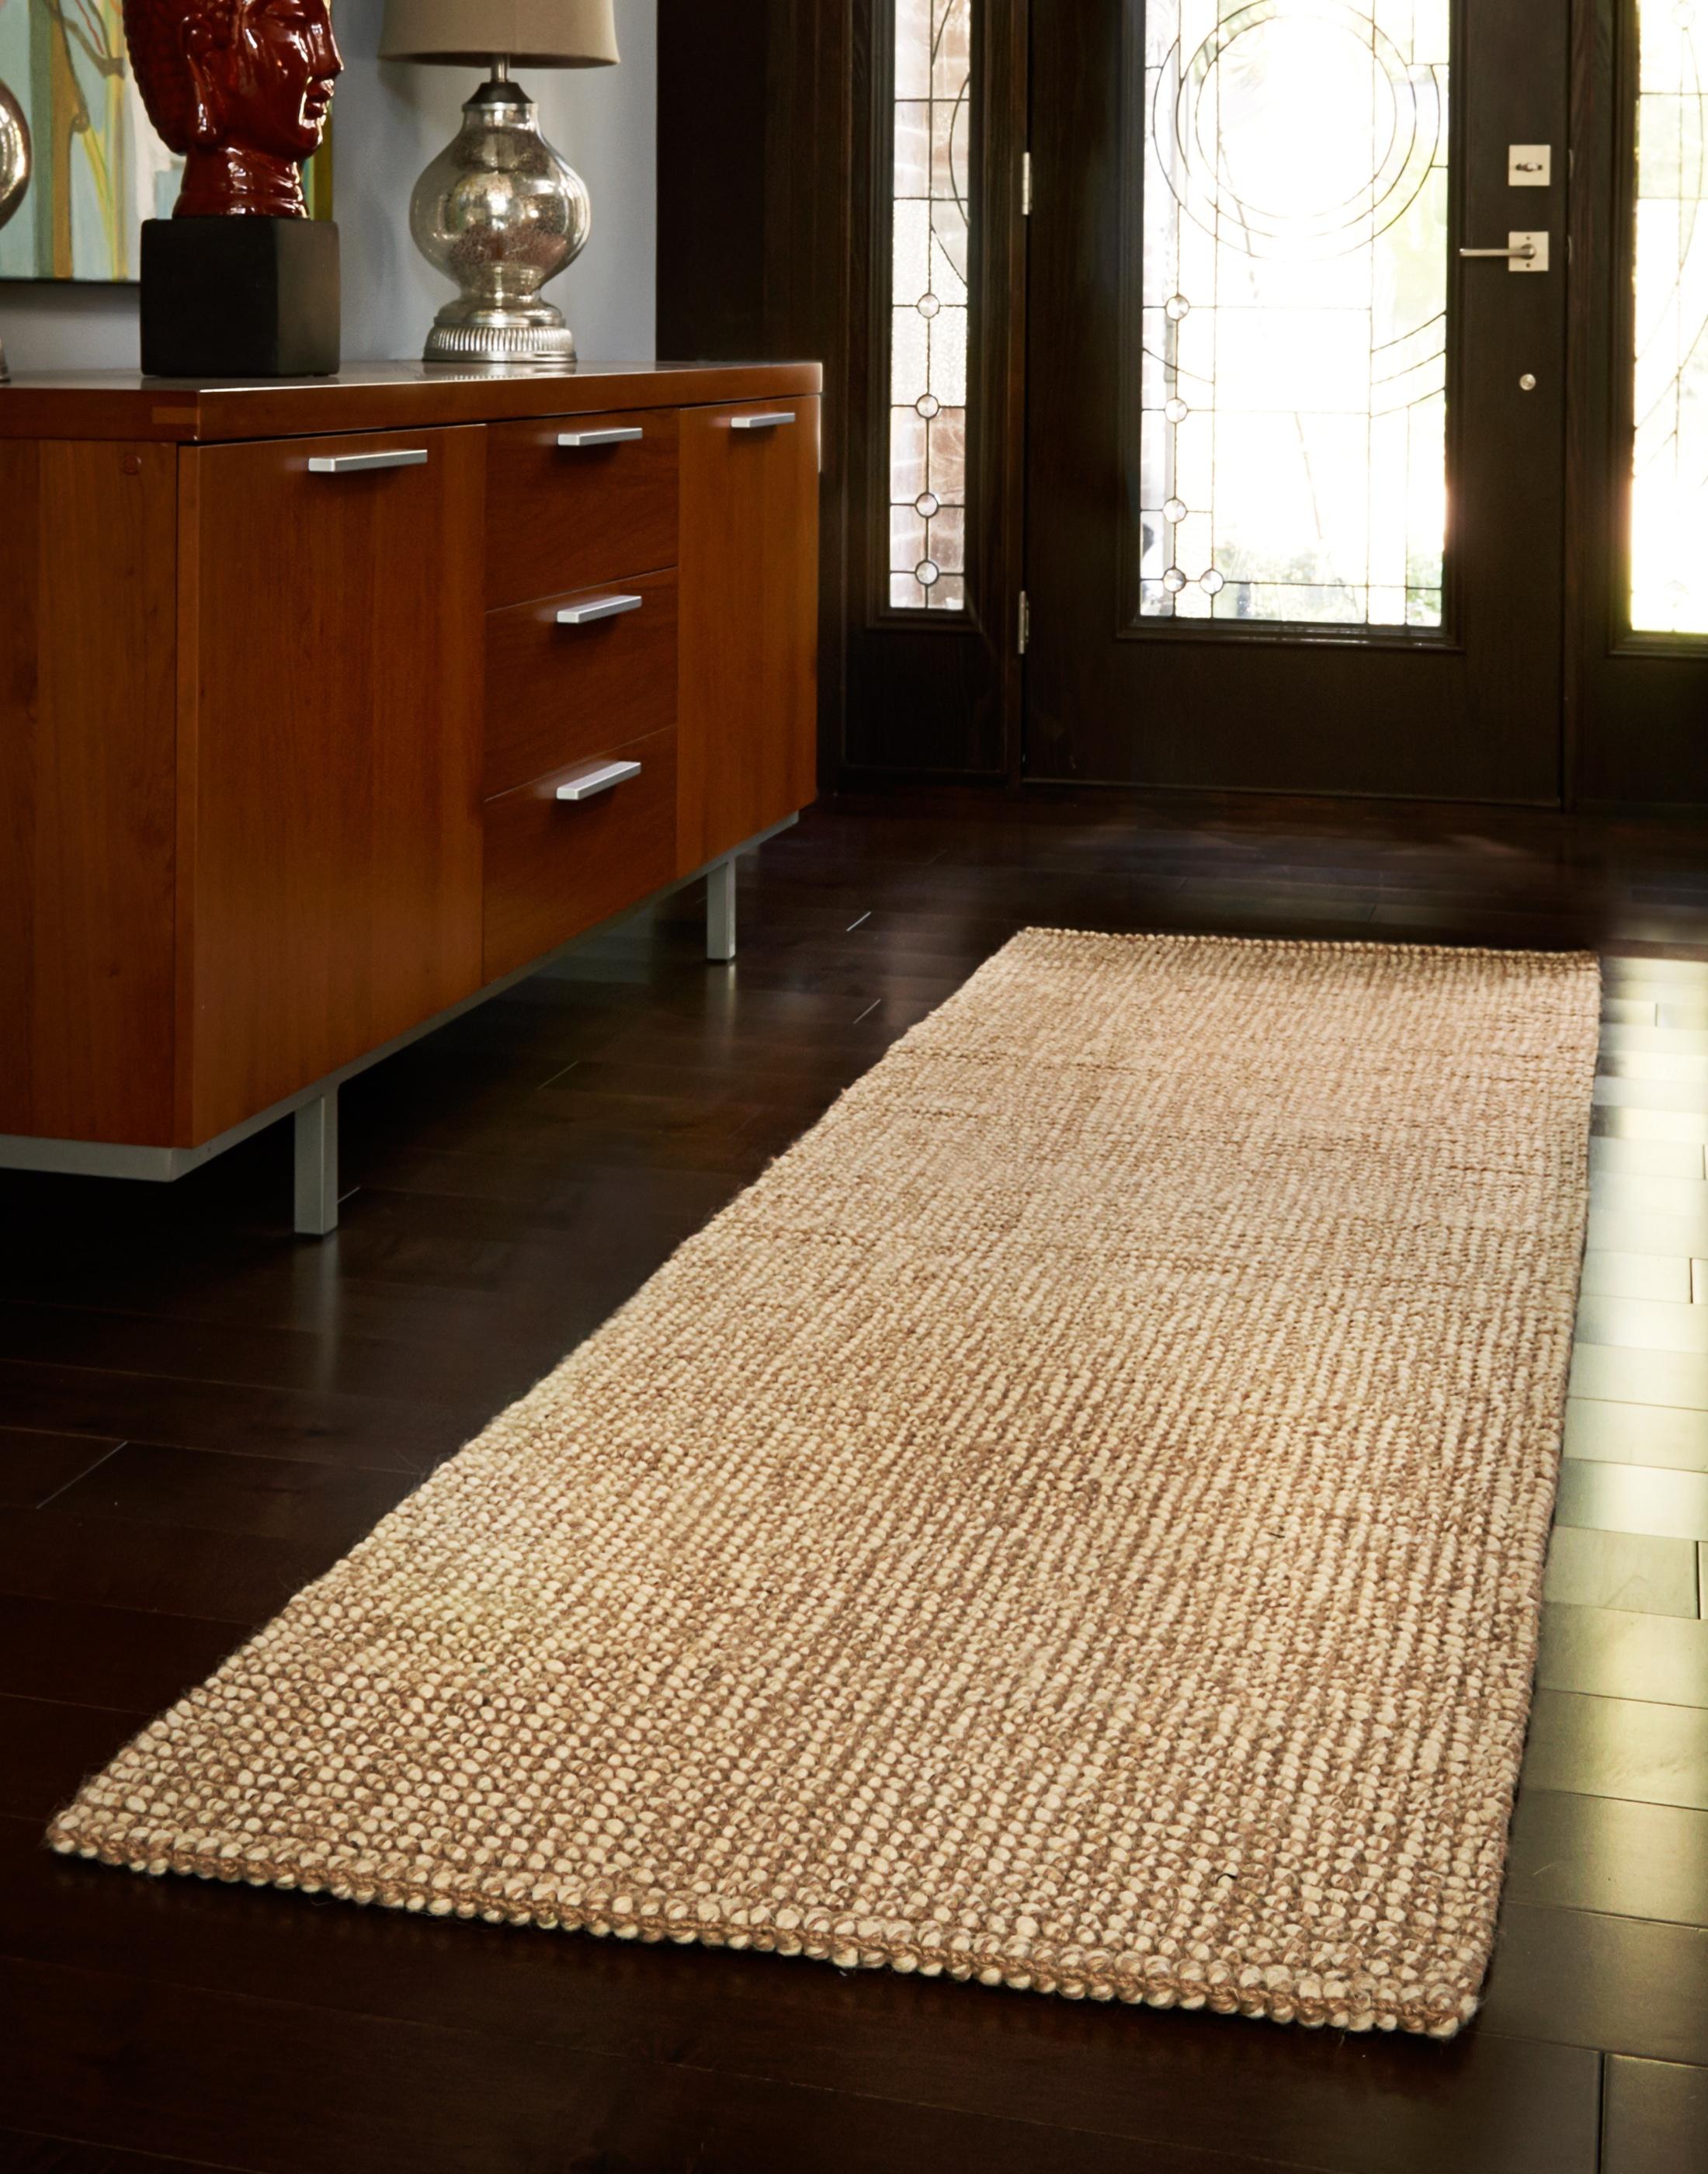 Office Hallway Carpet Runners Meze Blog Pertaining To Runner Carpets Hallway (#19 of 20)